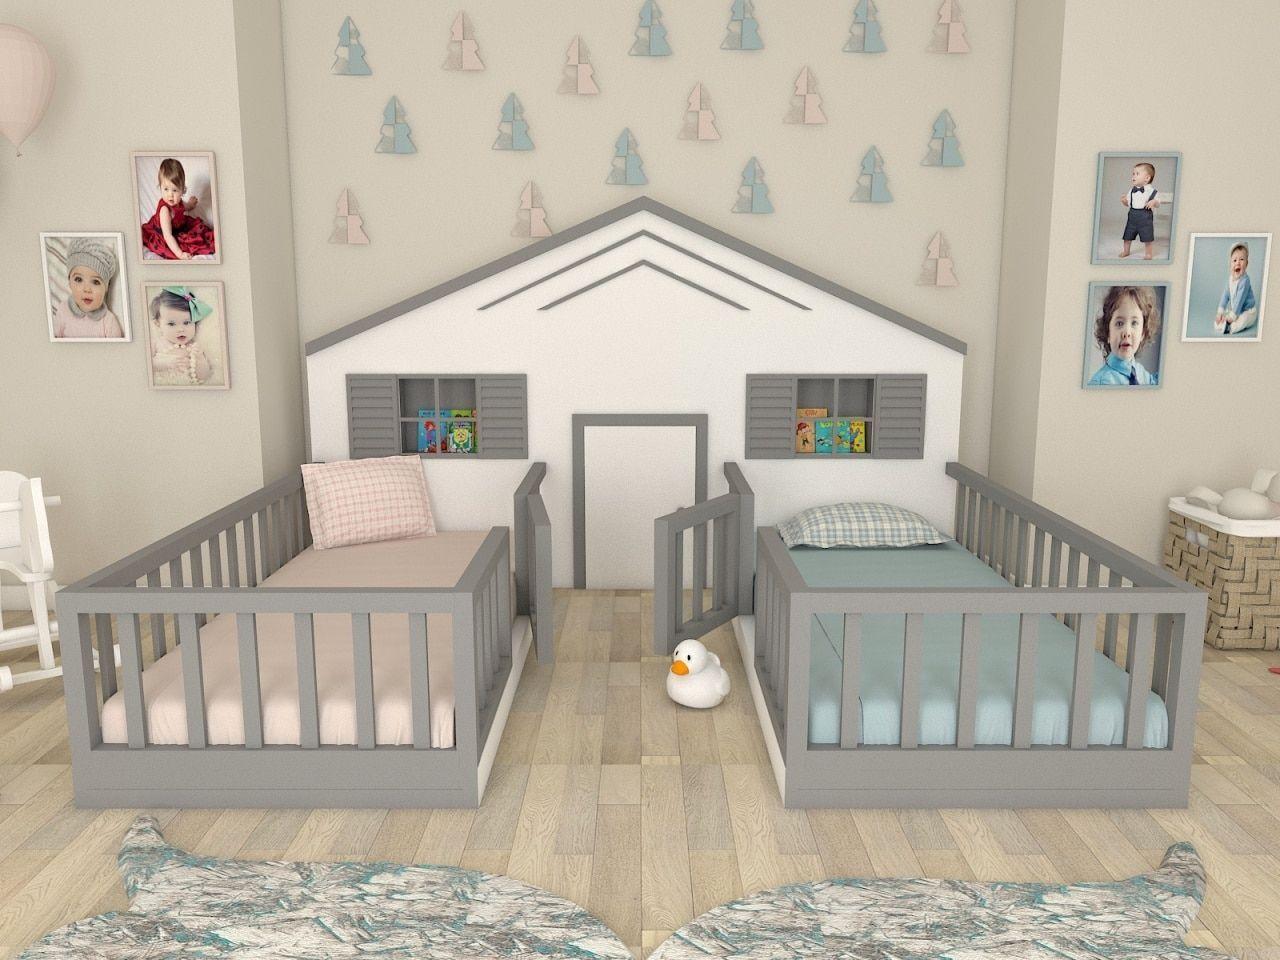 Montessori Yatak Hierapolis Montessori in 2020 Kleinkind